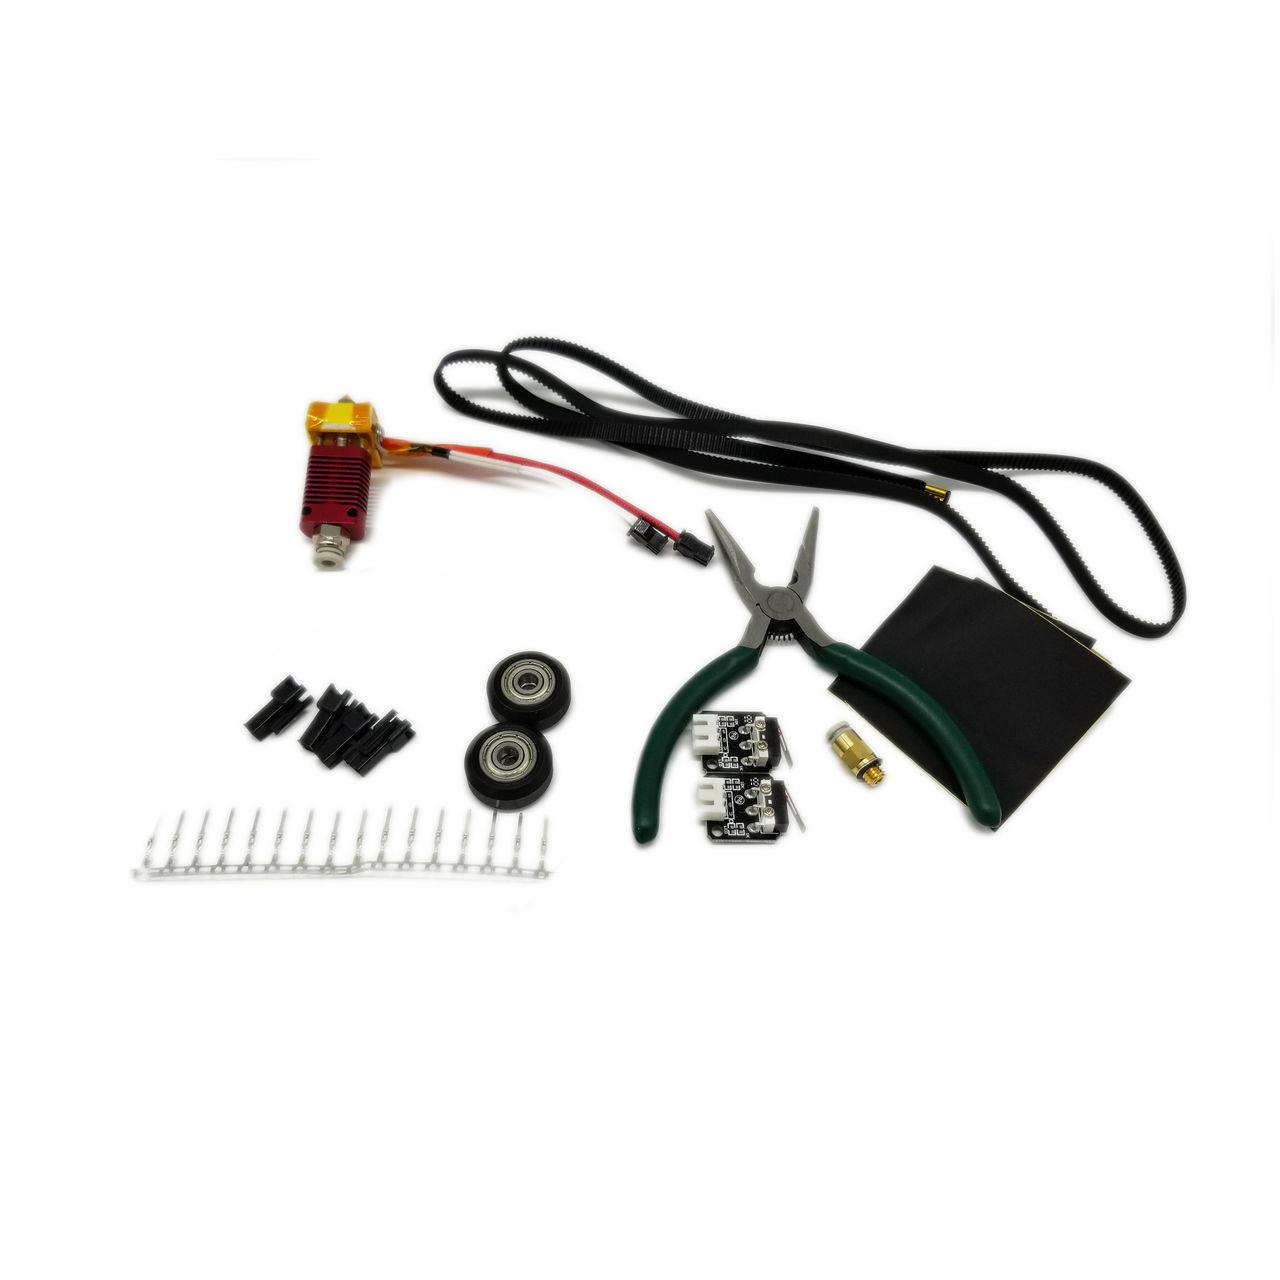 Creality CR-10 Repair Kit - 3D Printer Spare Parts